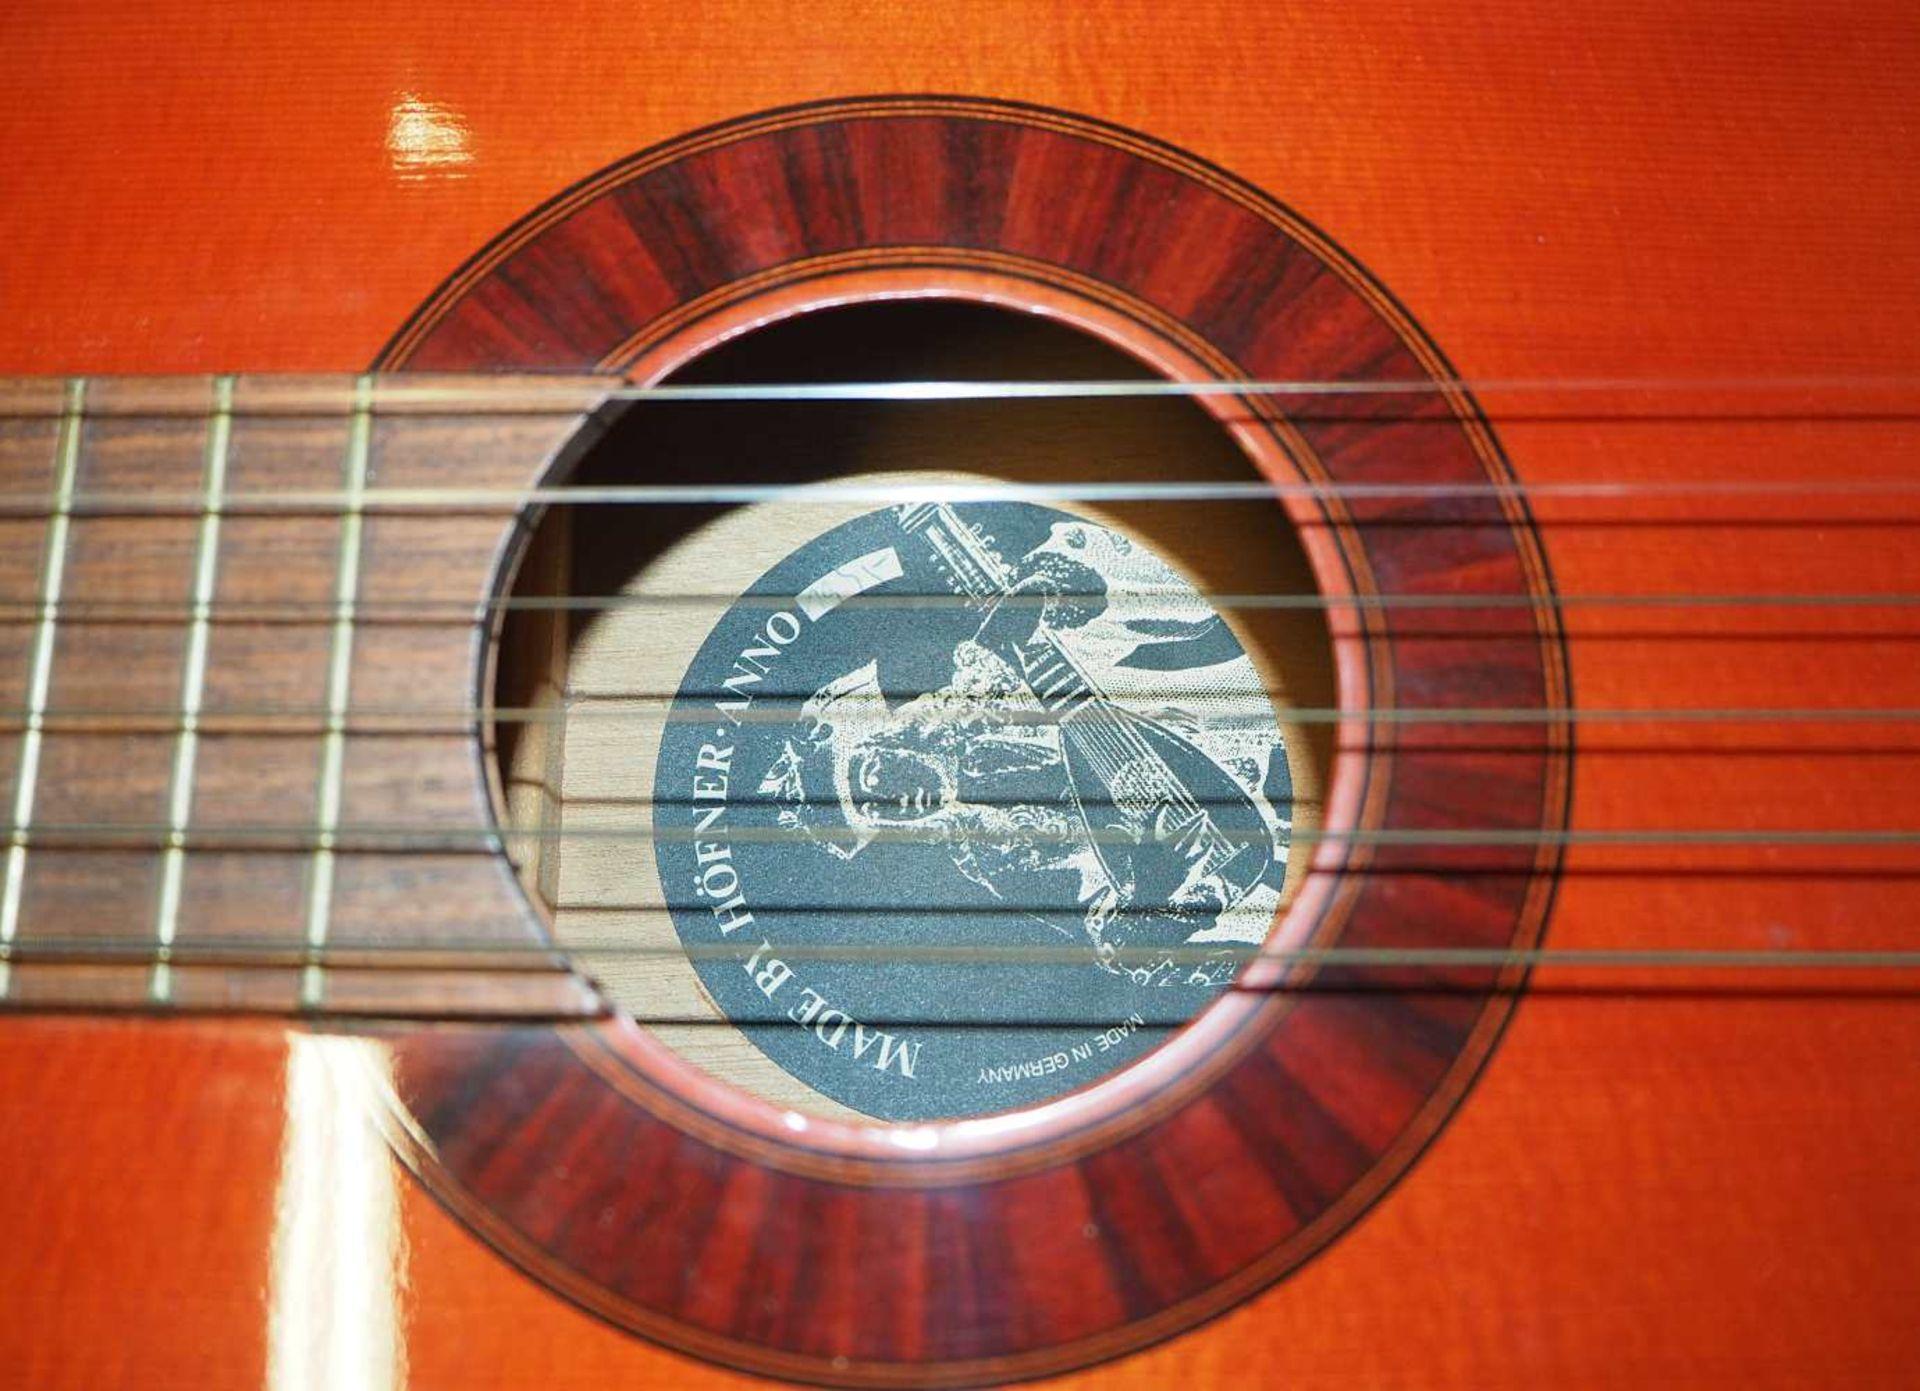 1 Konzert-Gitarre HÖFNER Modellnummer: 4840, wohl z.T. Rosenholz min. intarsiert auf - Bild 5 aus 8